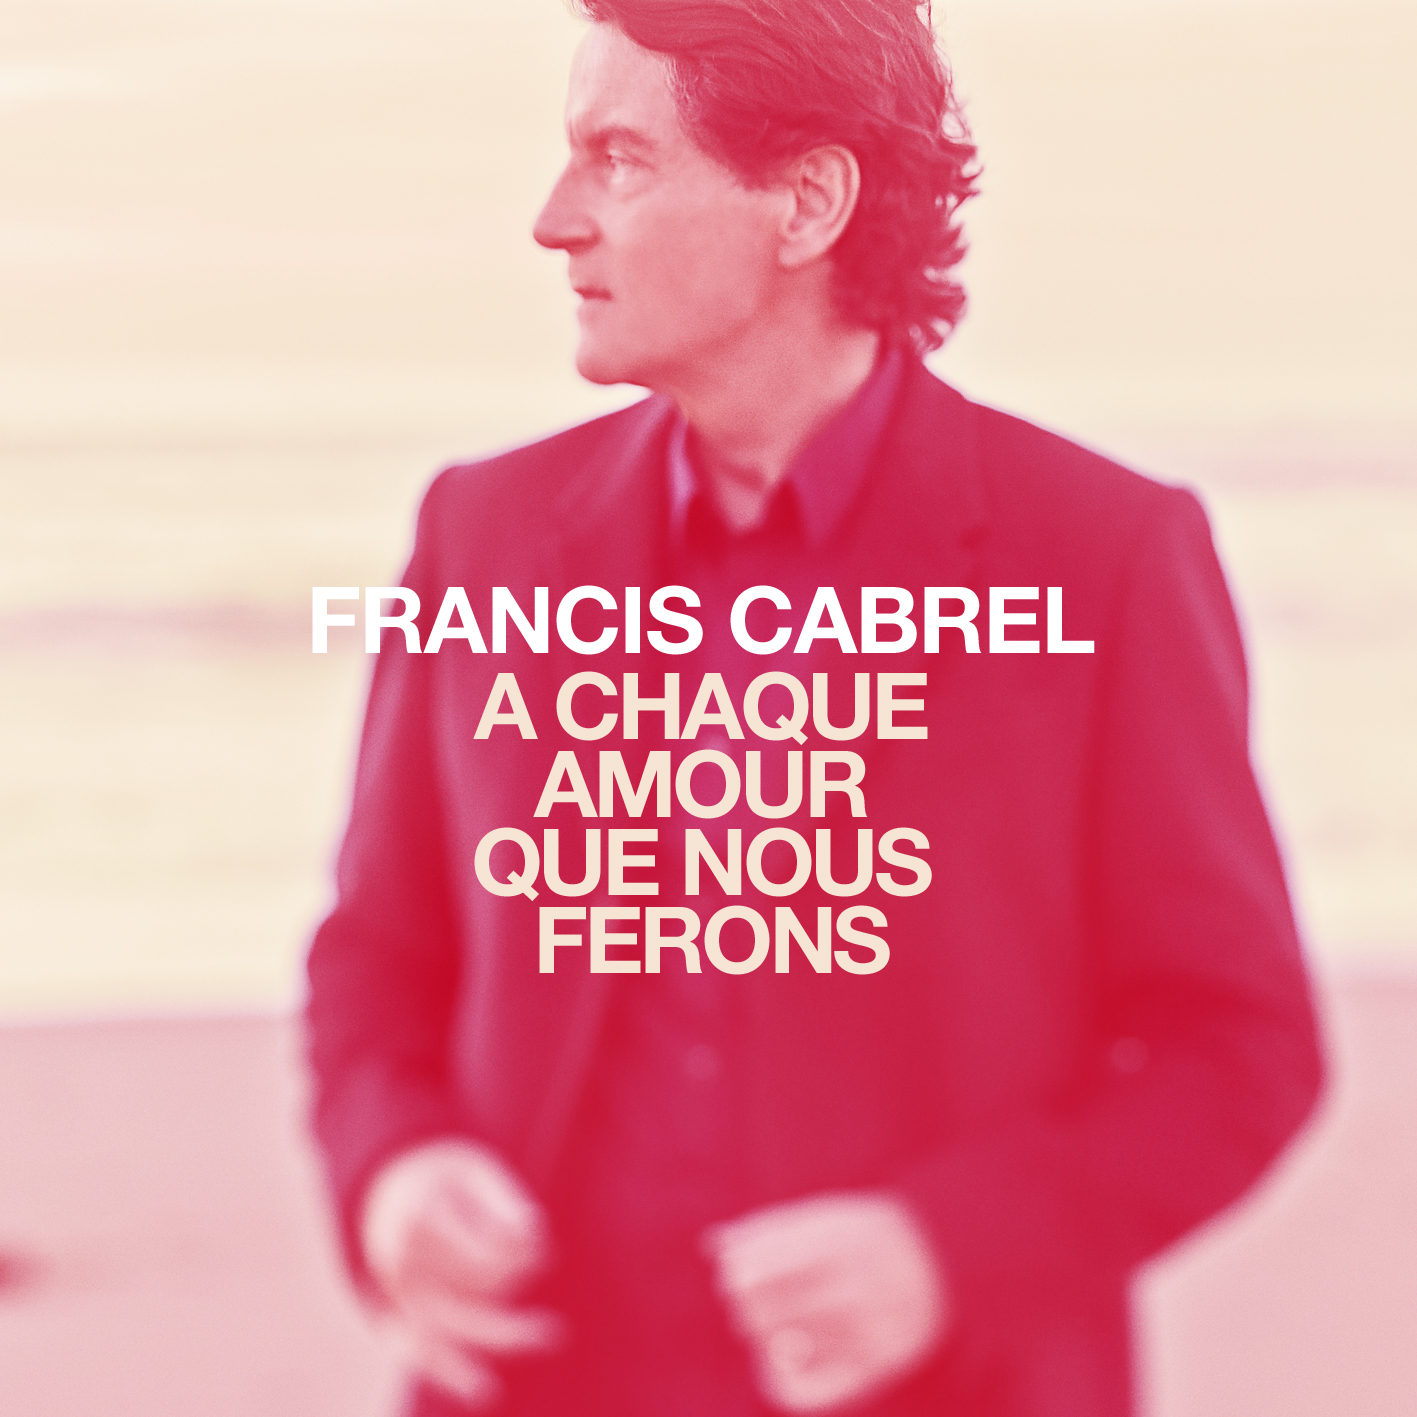 Francis Cabrel - A Chaque Amour... - rvb